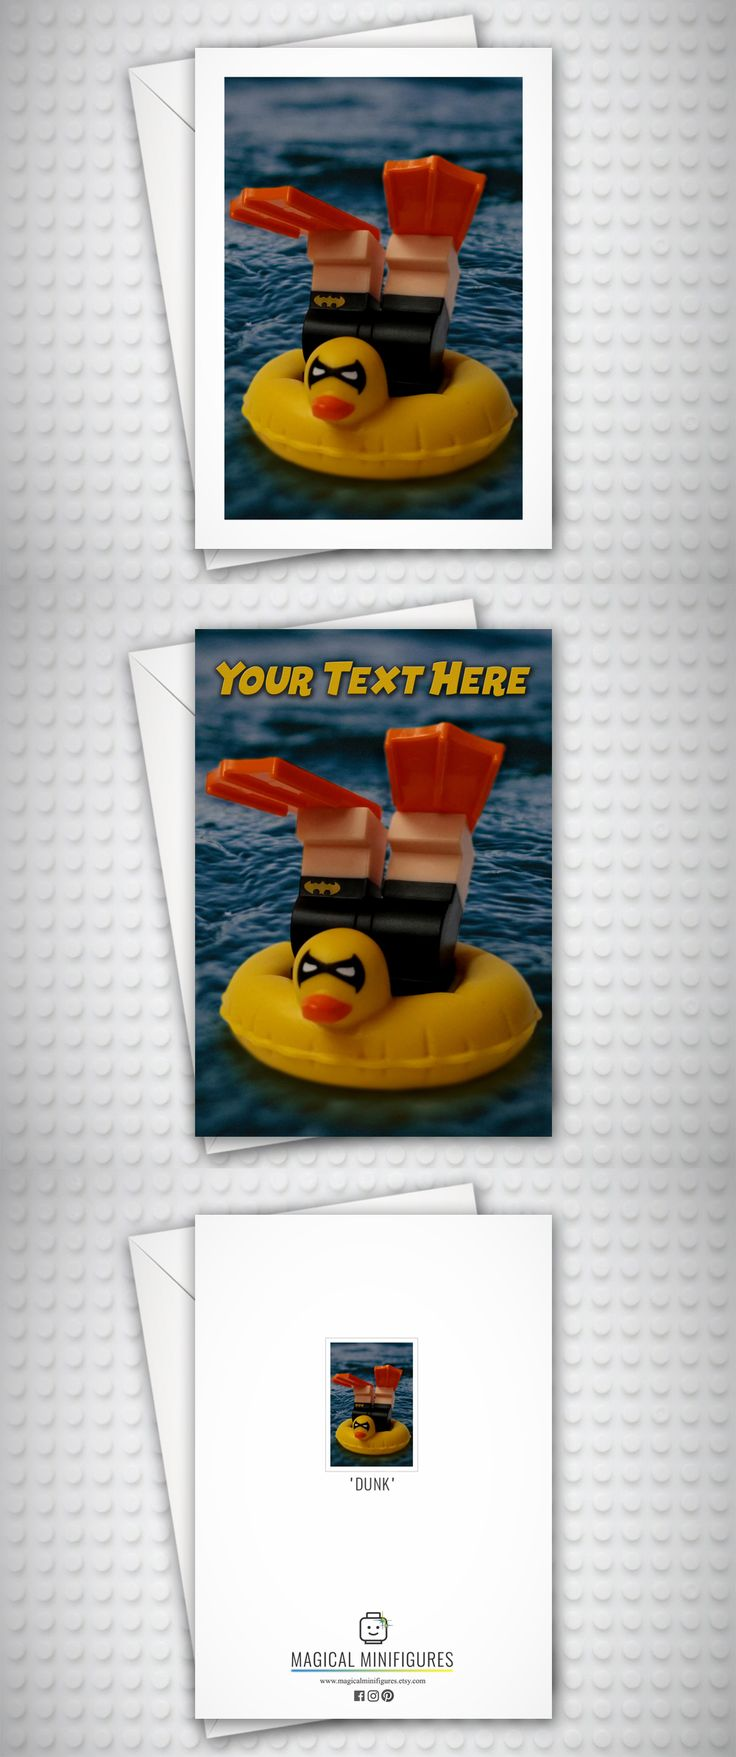 Lego Batman - Lego Minifigure - Vaction Batman - Lego Batman Movie - Funny Birthday Card - Swimming - Personalised Card